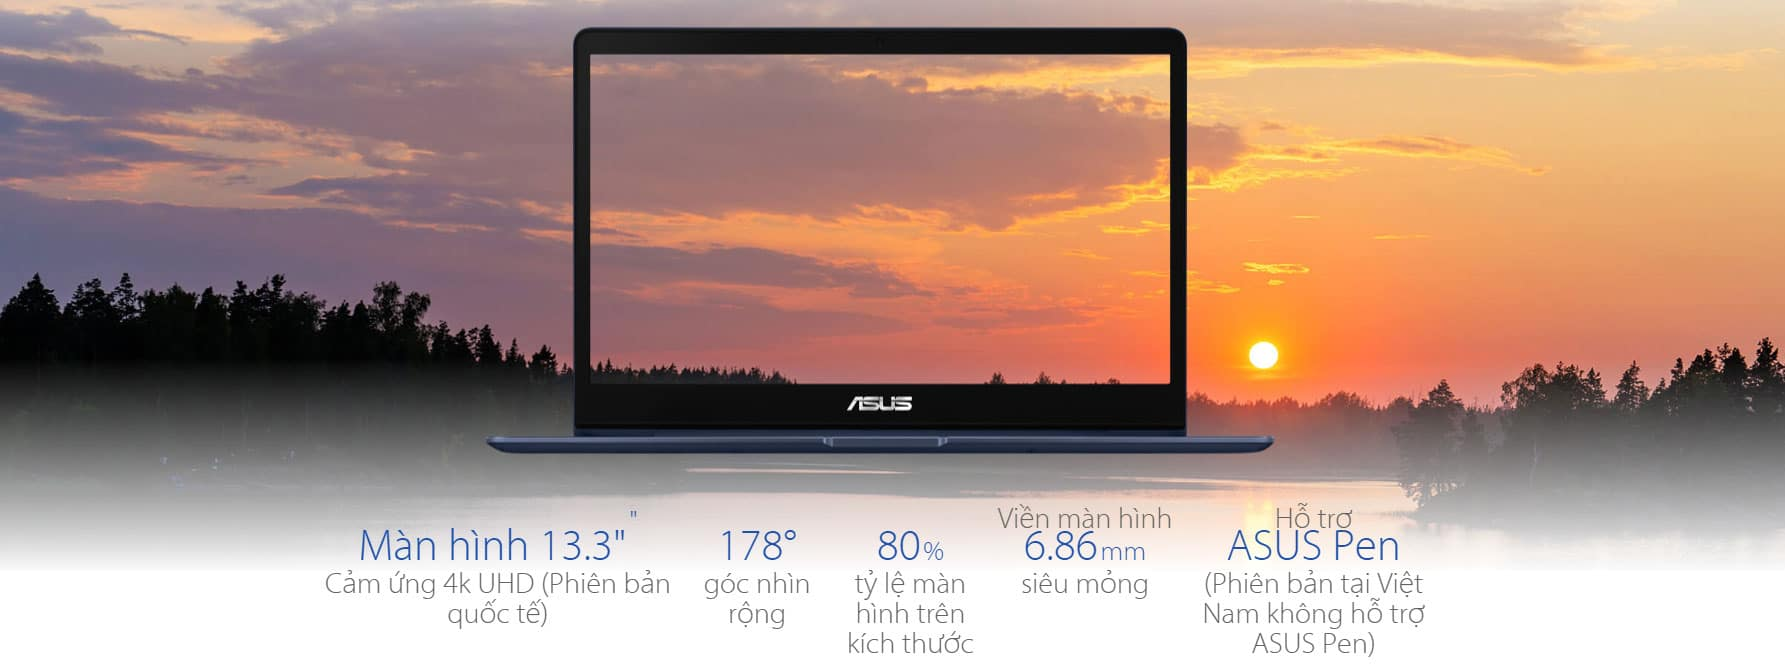 ASUS ZenBook 13 UX331UN – Mỏng nhẹ, tinh tế, sang trọng - 278854